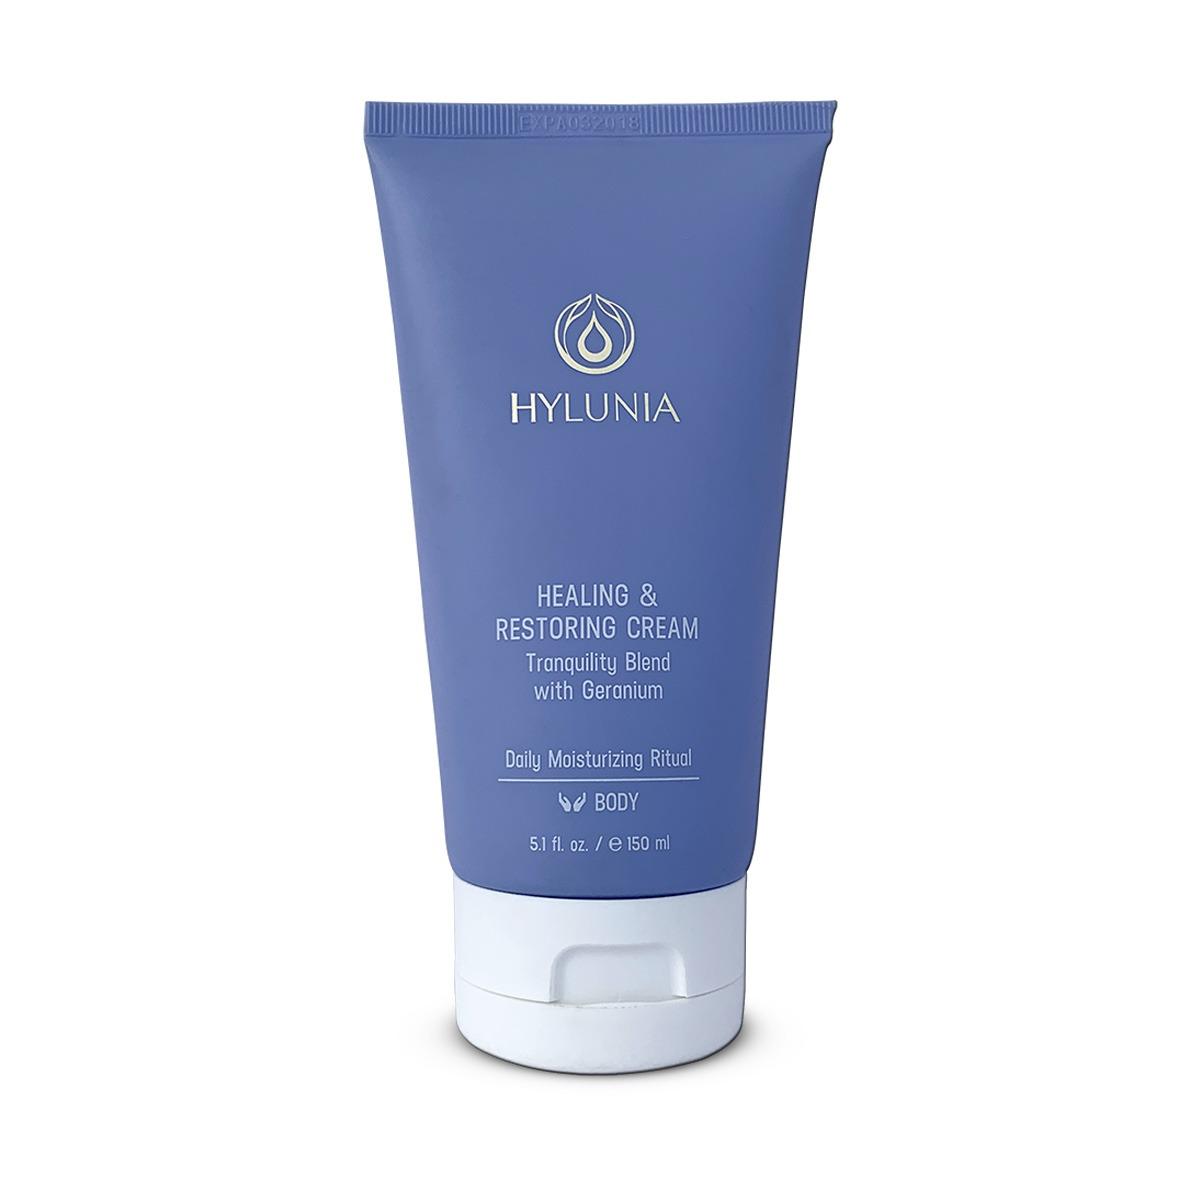 Healing & Restoring Cream - Tranquility Blend Geranium